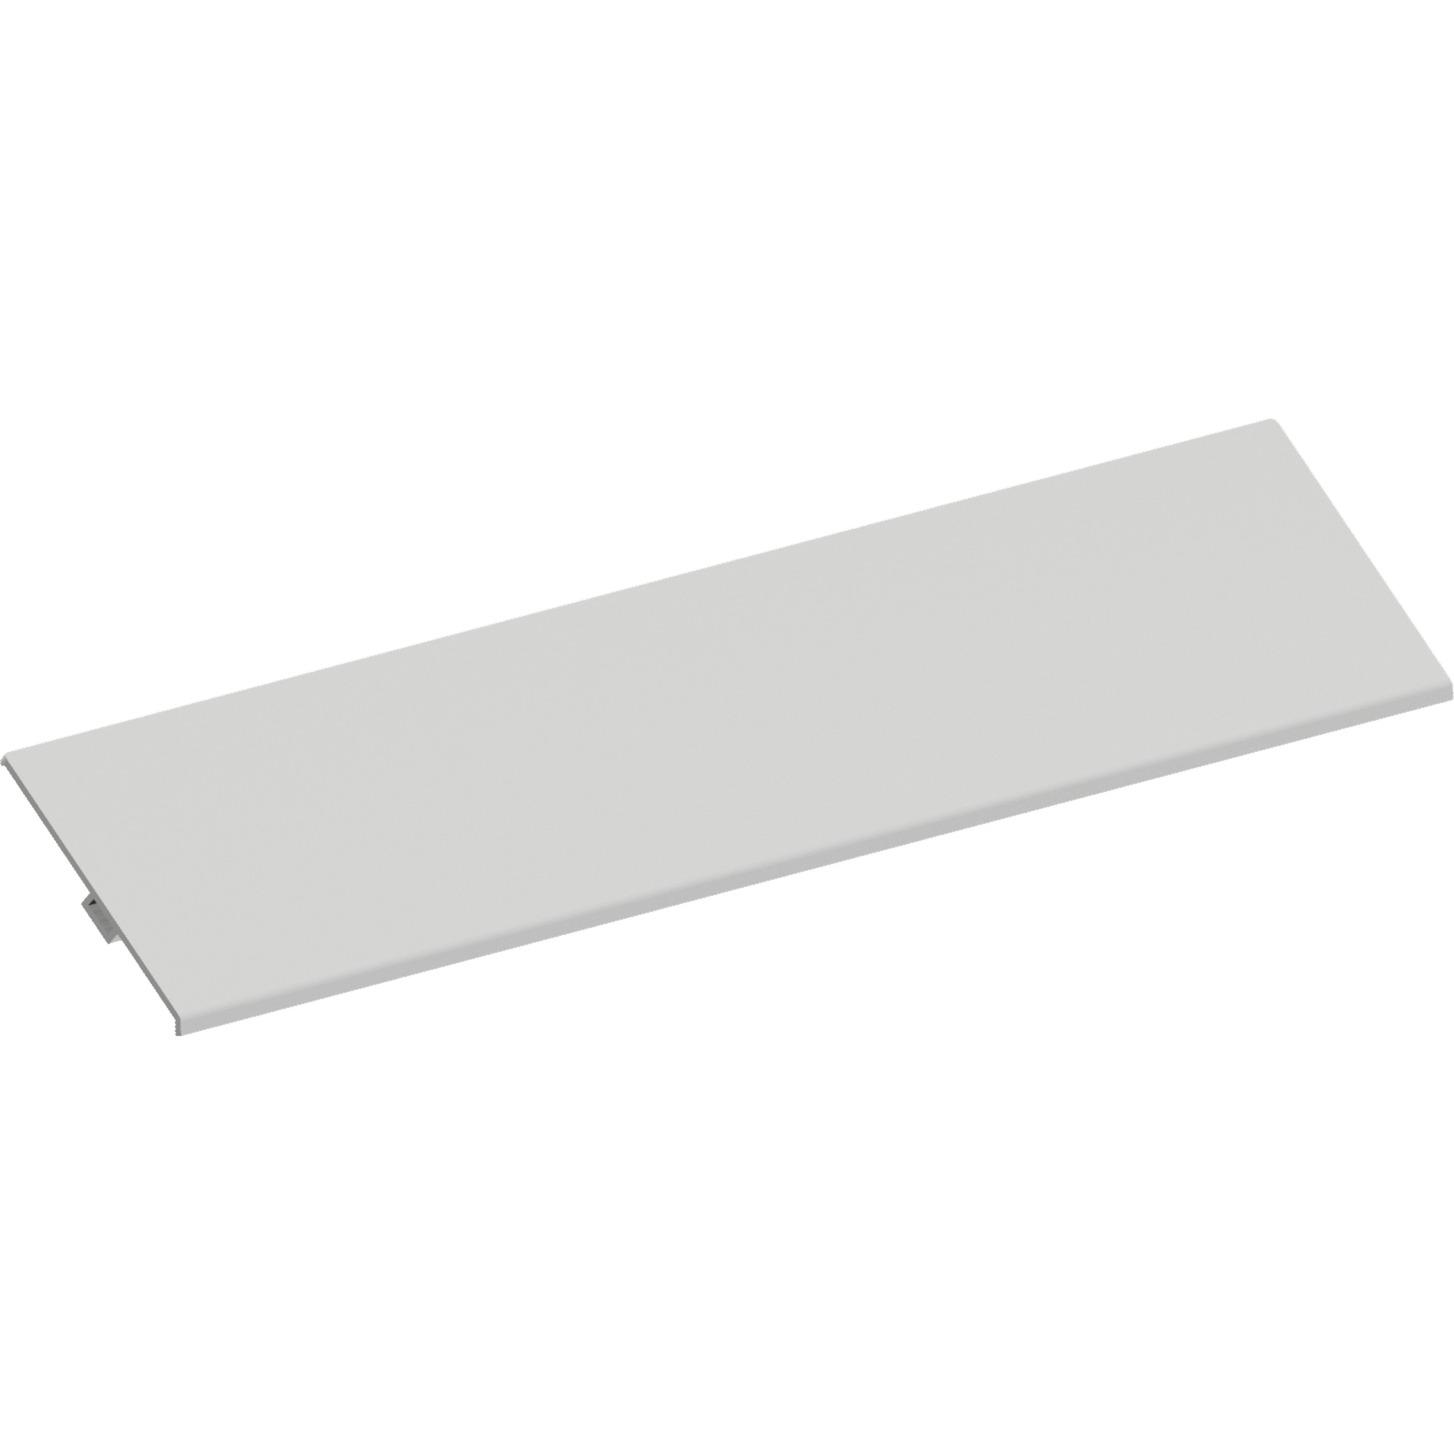 9250034-tilbehor-til-skrivebordsbakke-table-leaf